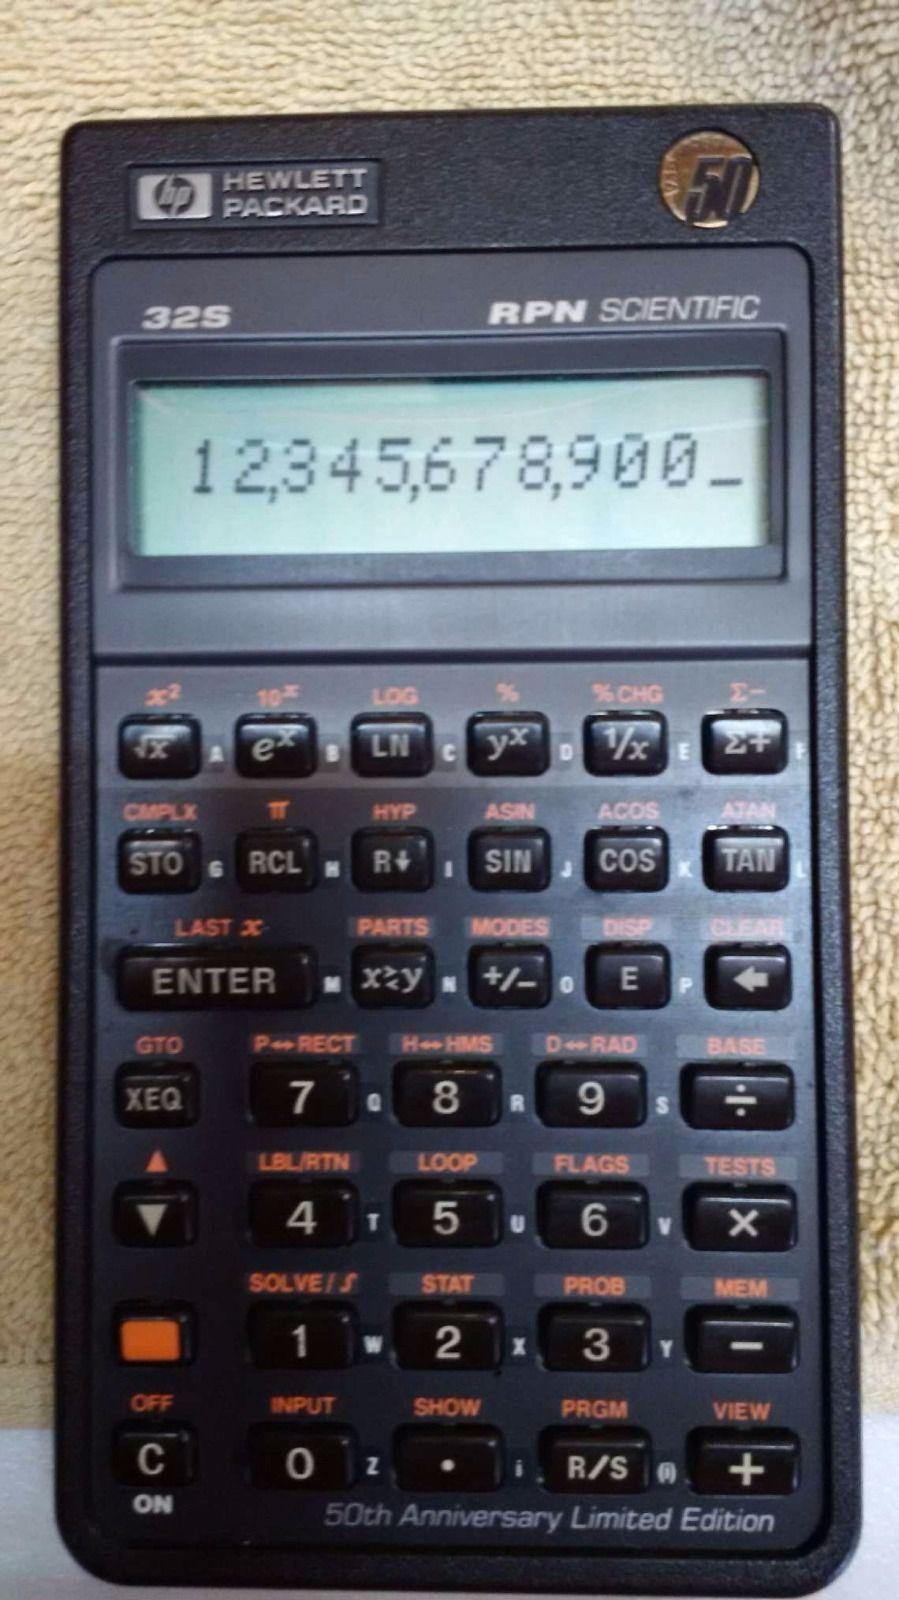 Hewlett Packard Calculator  HpS Anniversary Edition  Hewlett